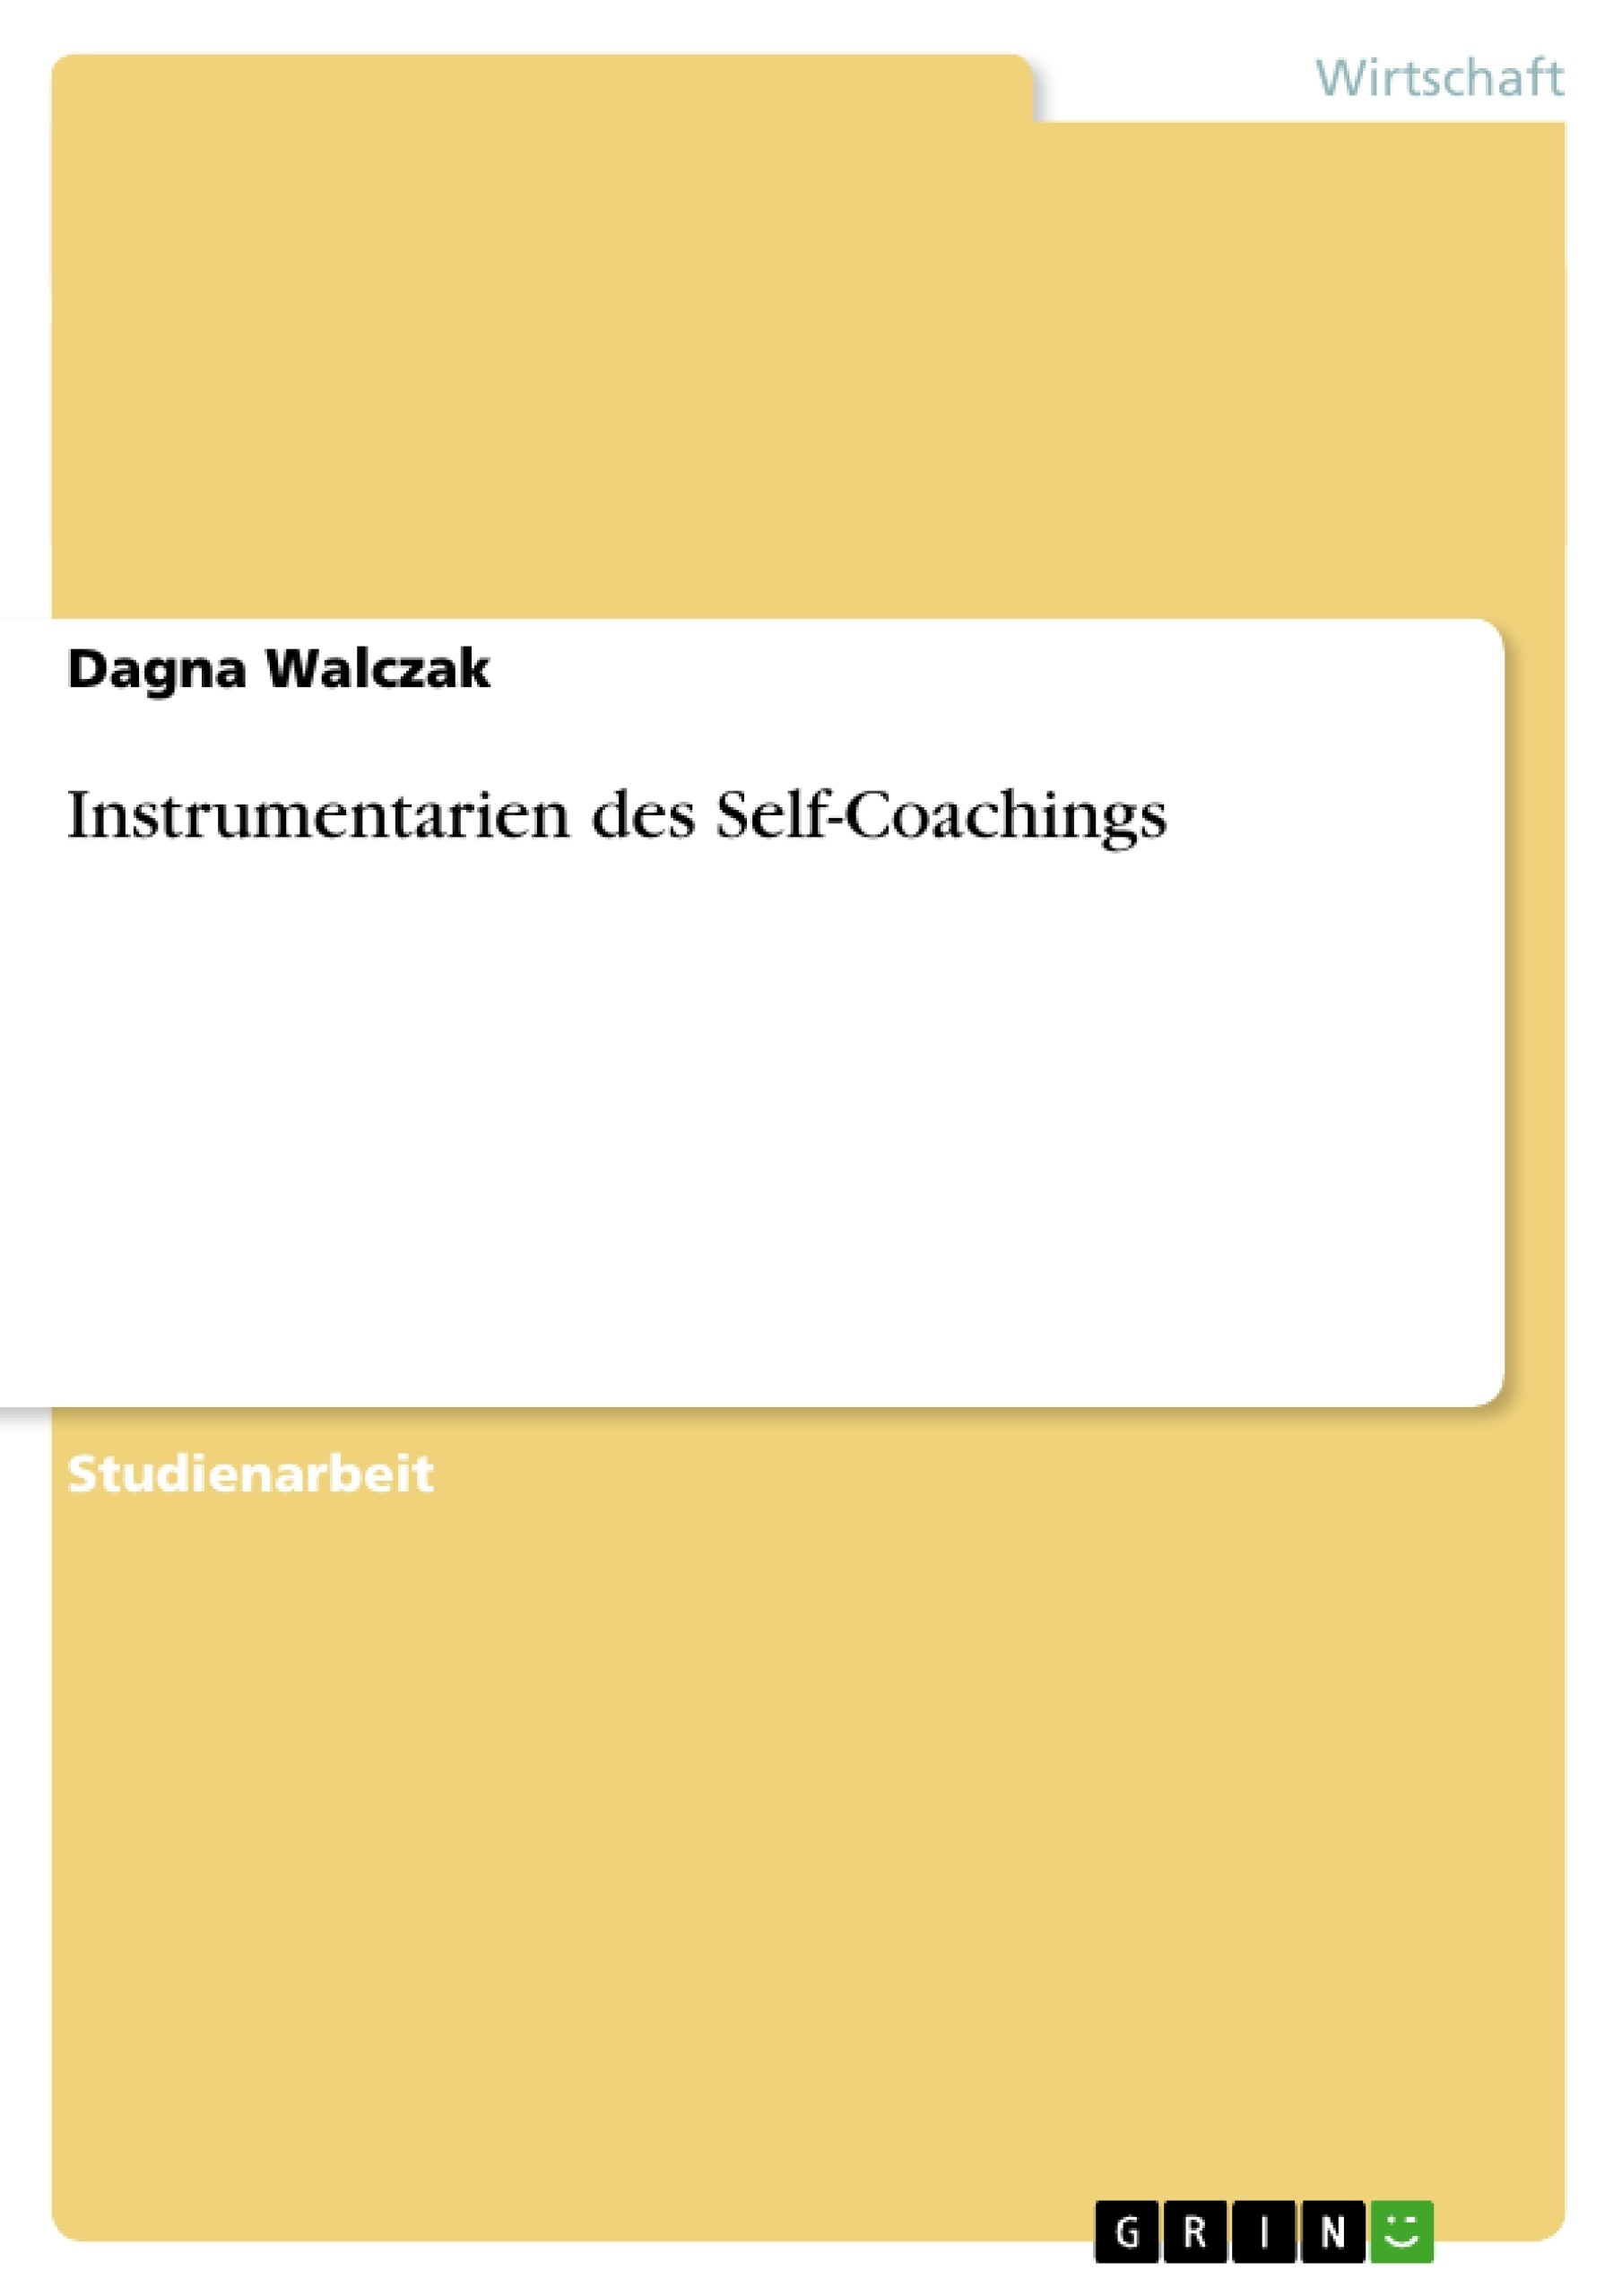 Titel: Instrumentarien des Self-Coachings